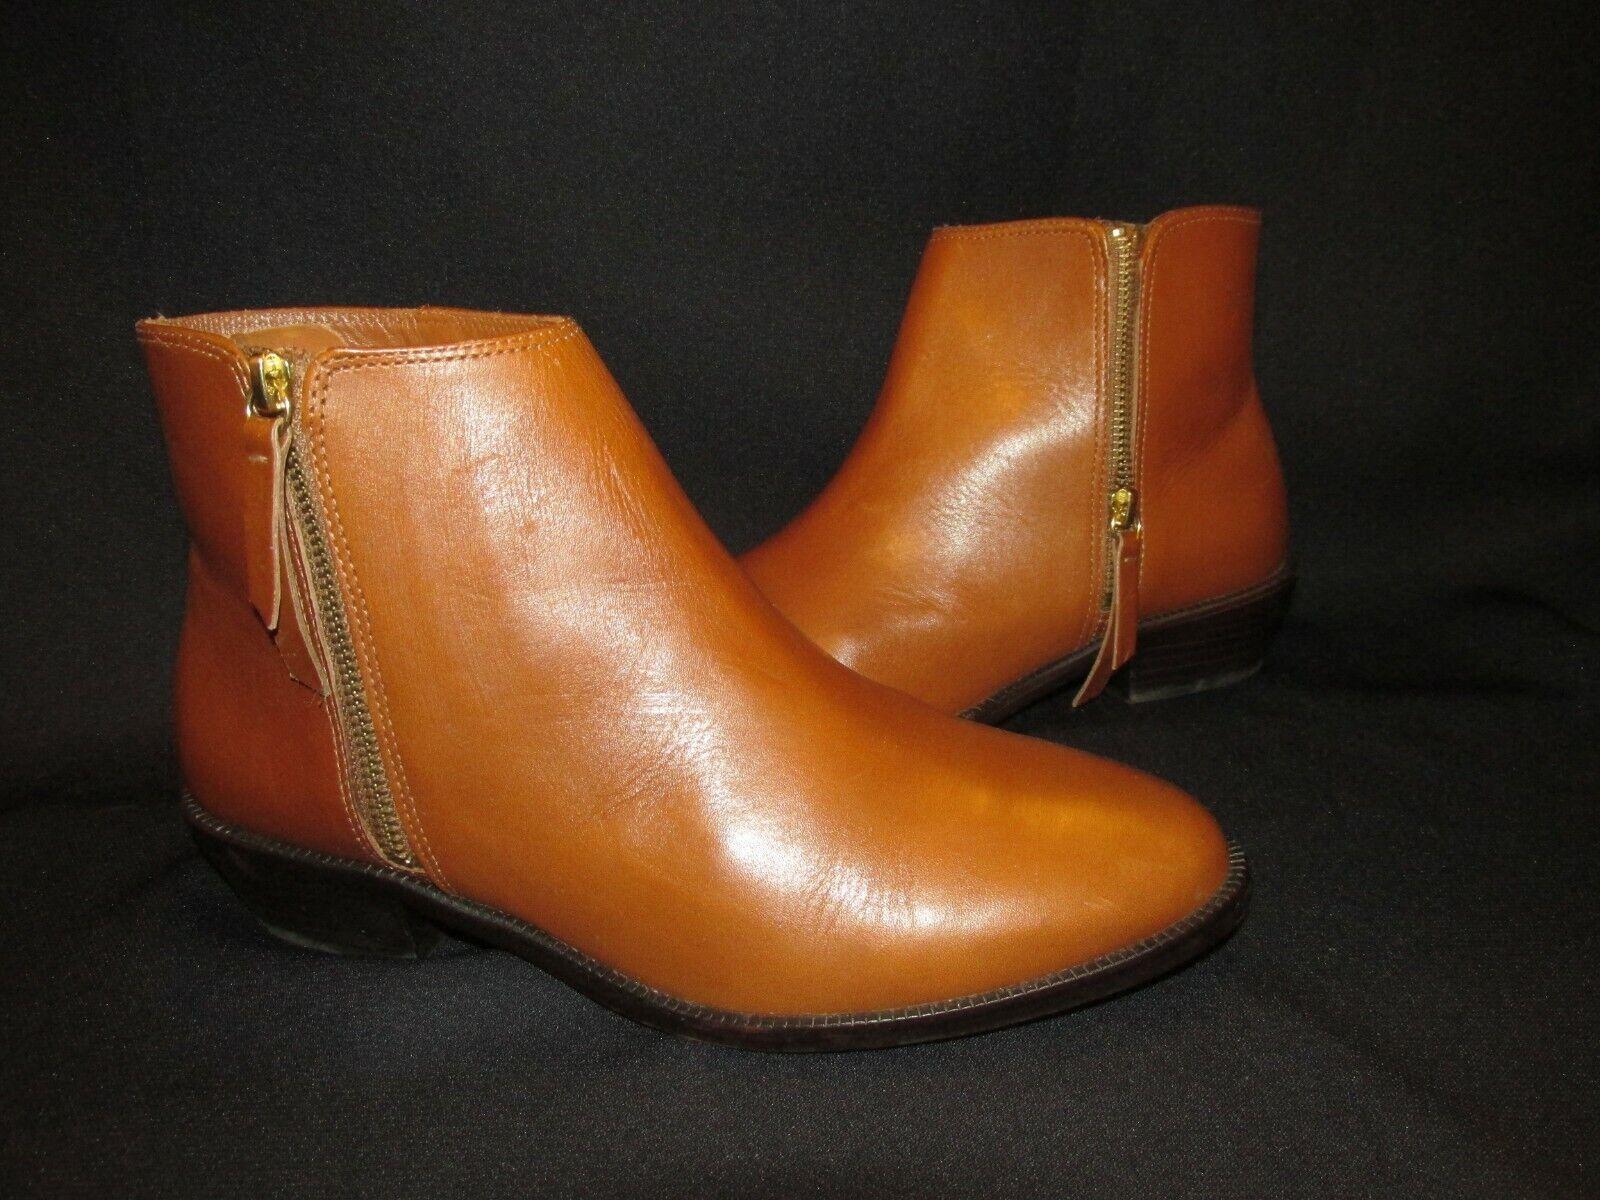 J. Crew Frankie E0537 Brown Leather Ankle Boot Zip Side 1-3 8  Heel  Women's 9M